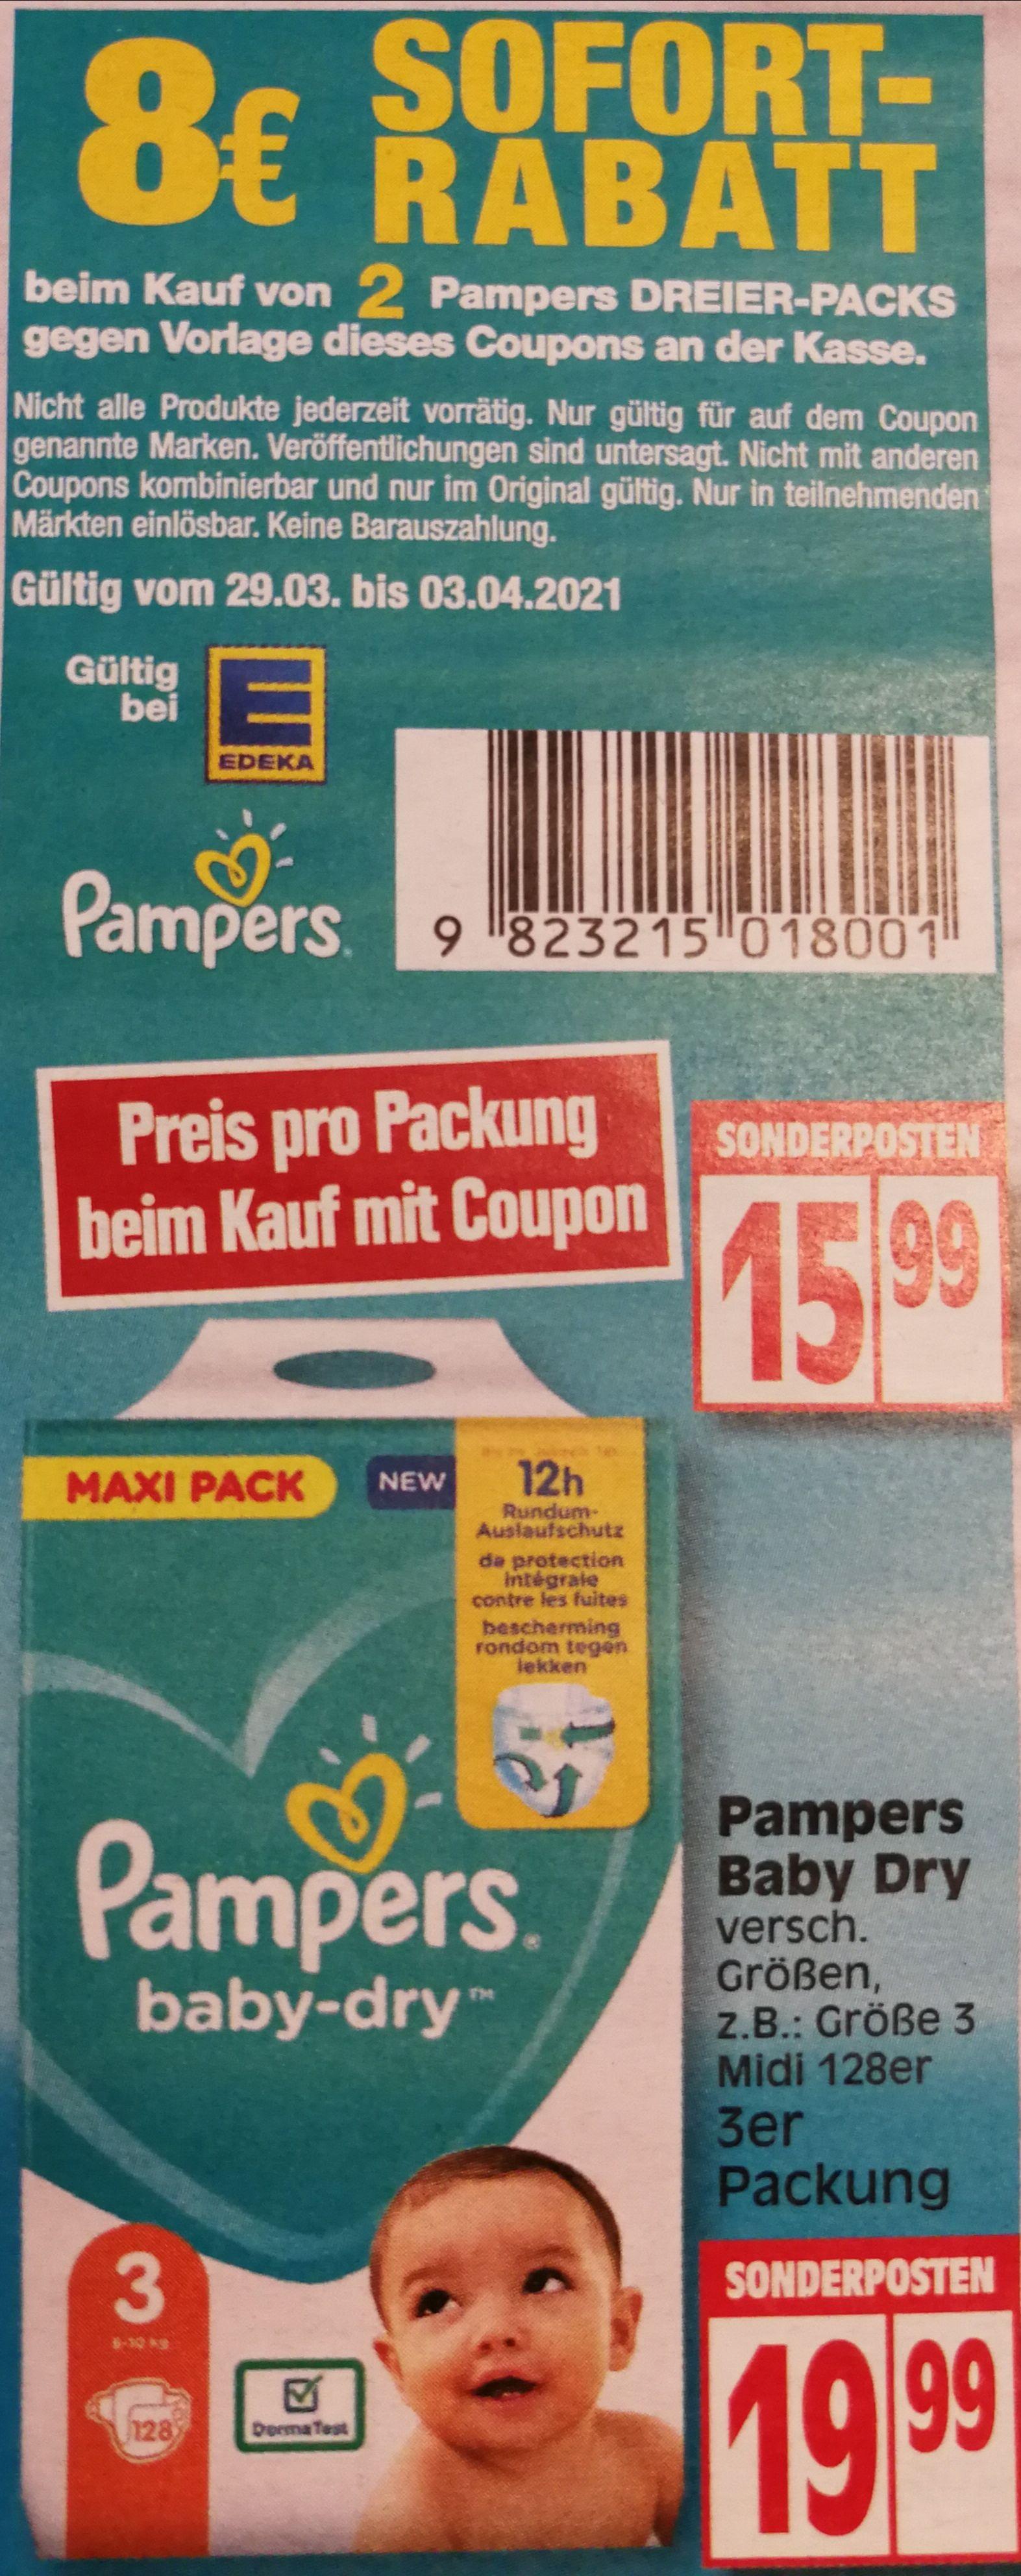 [Edeka lokal] 8 Euro Rabatt auf Pampers Baby-Dry Windeln